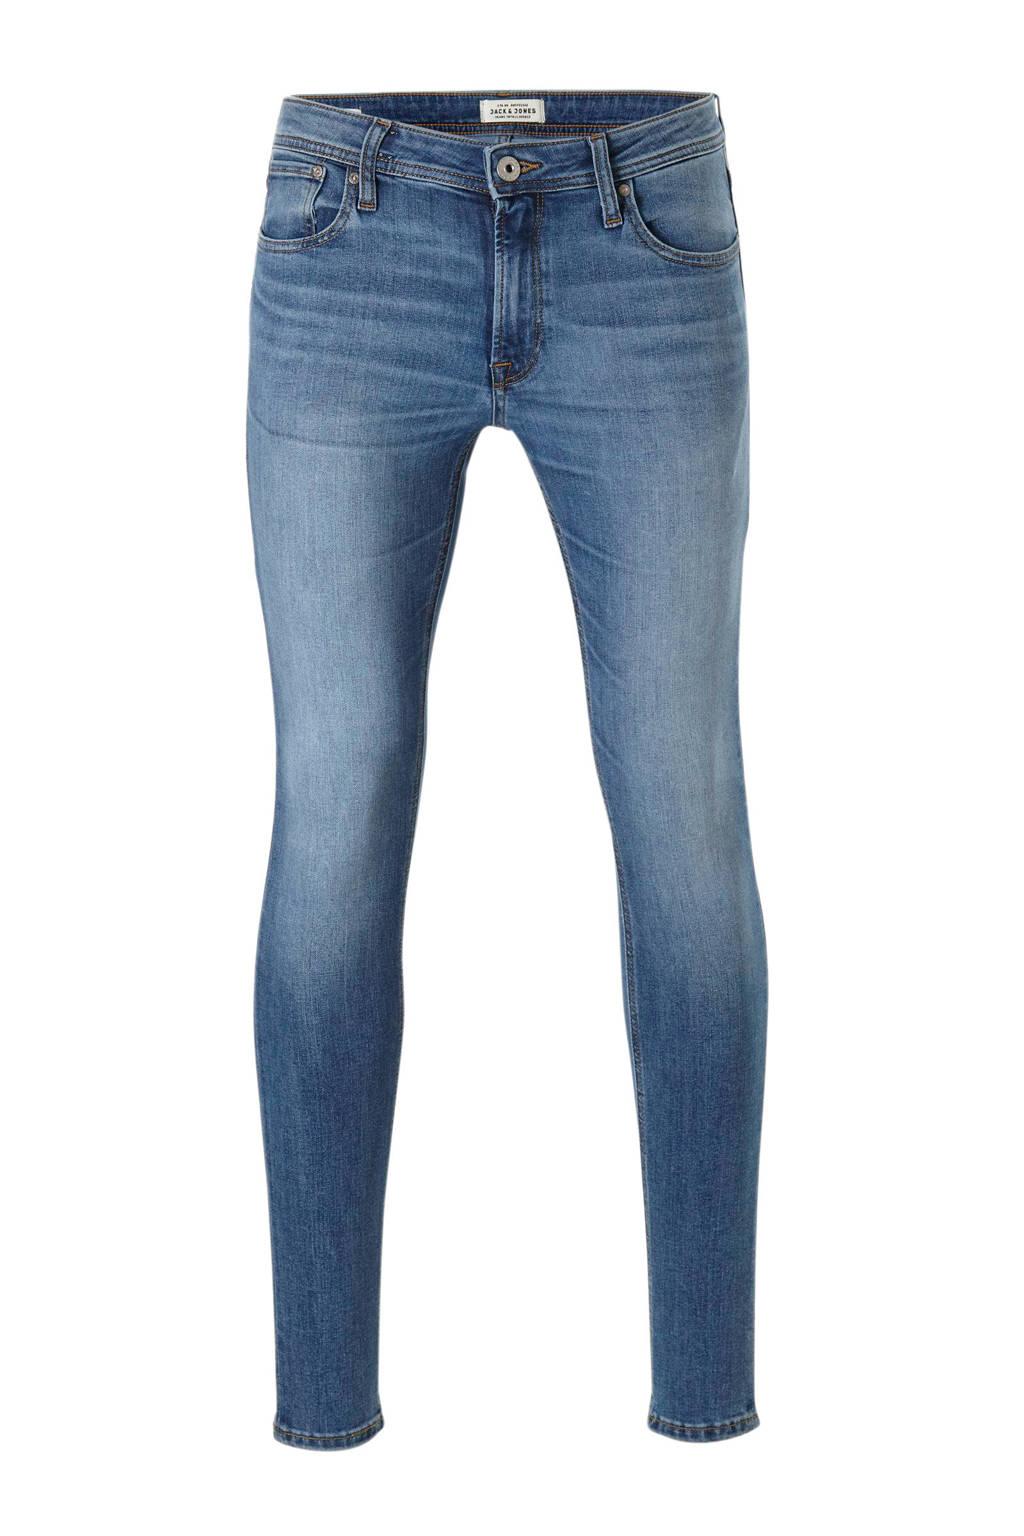 JACK & JONES ORIGINALS super skinny jeans Tom, Light denim